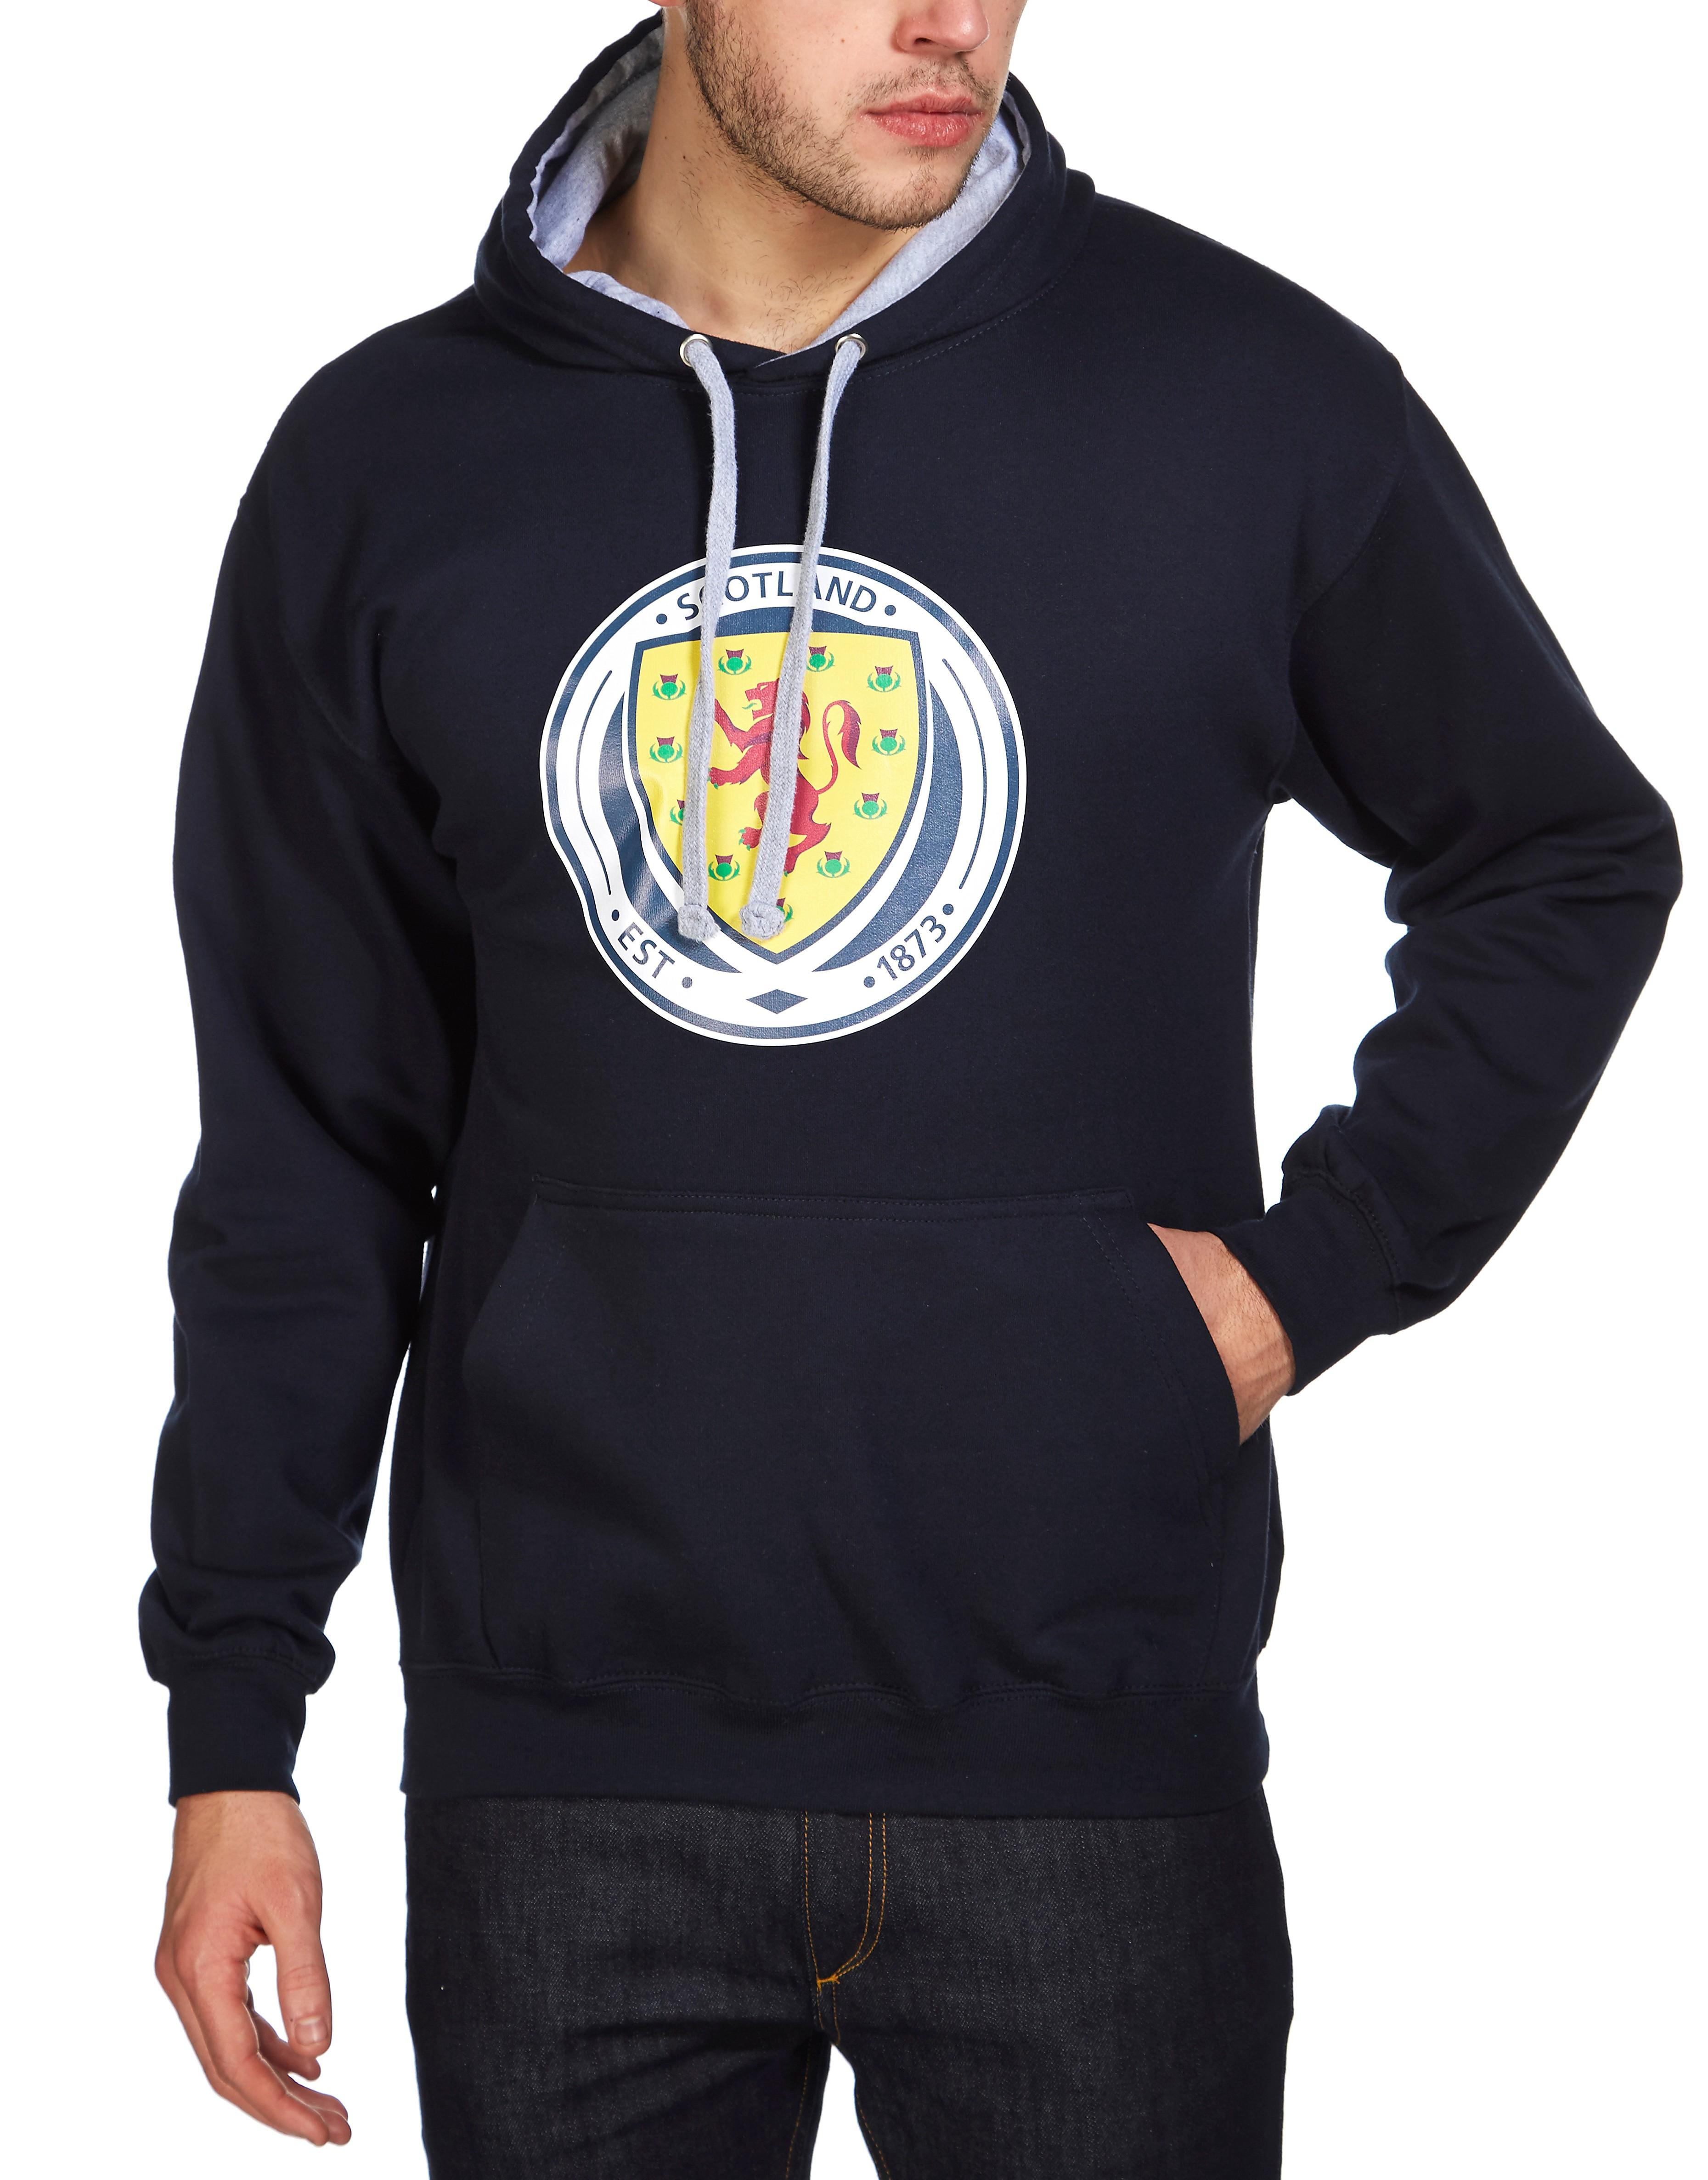 Official Team Scotland FA Crest Hoody